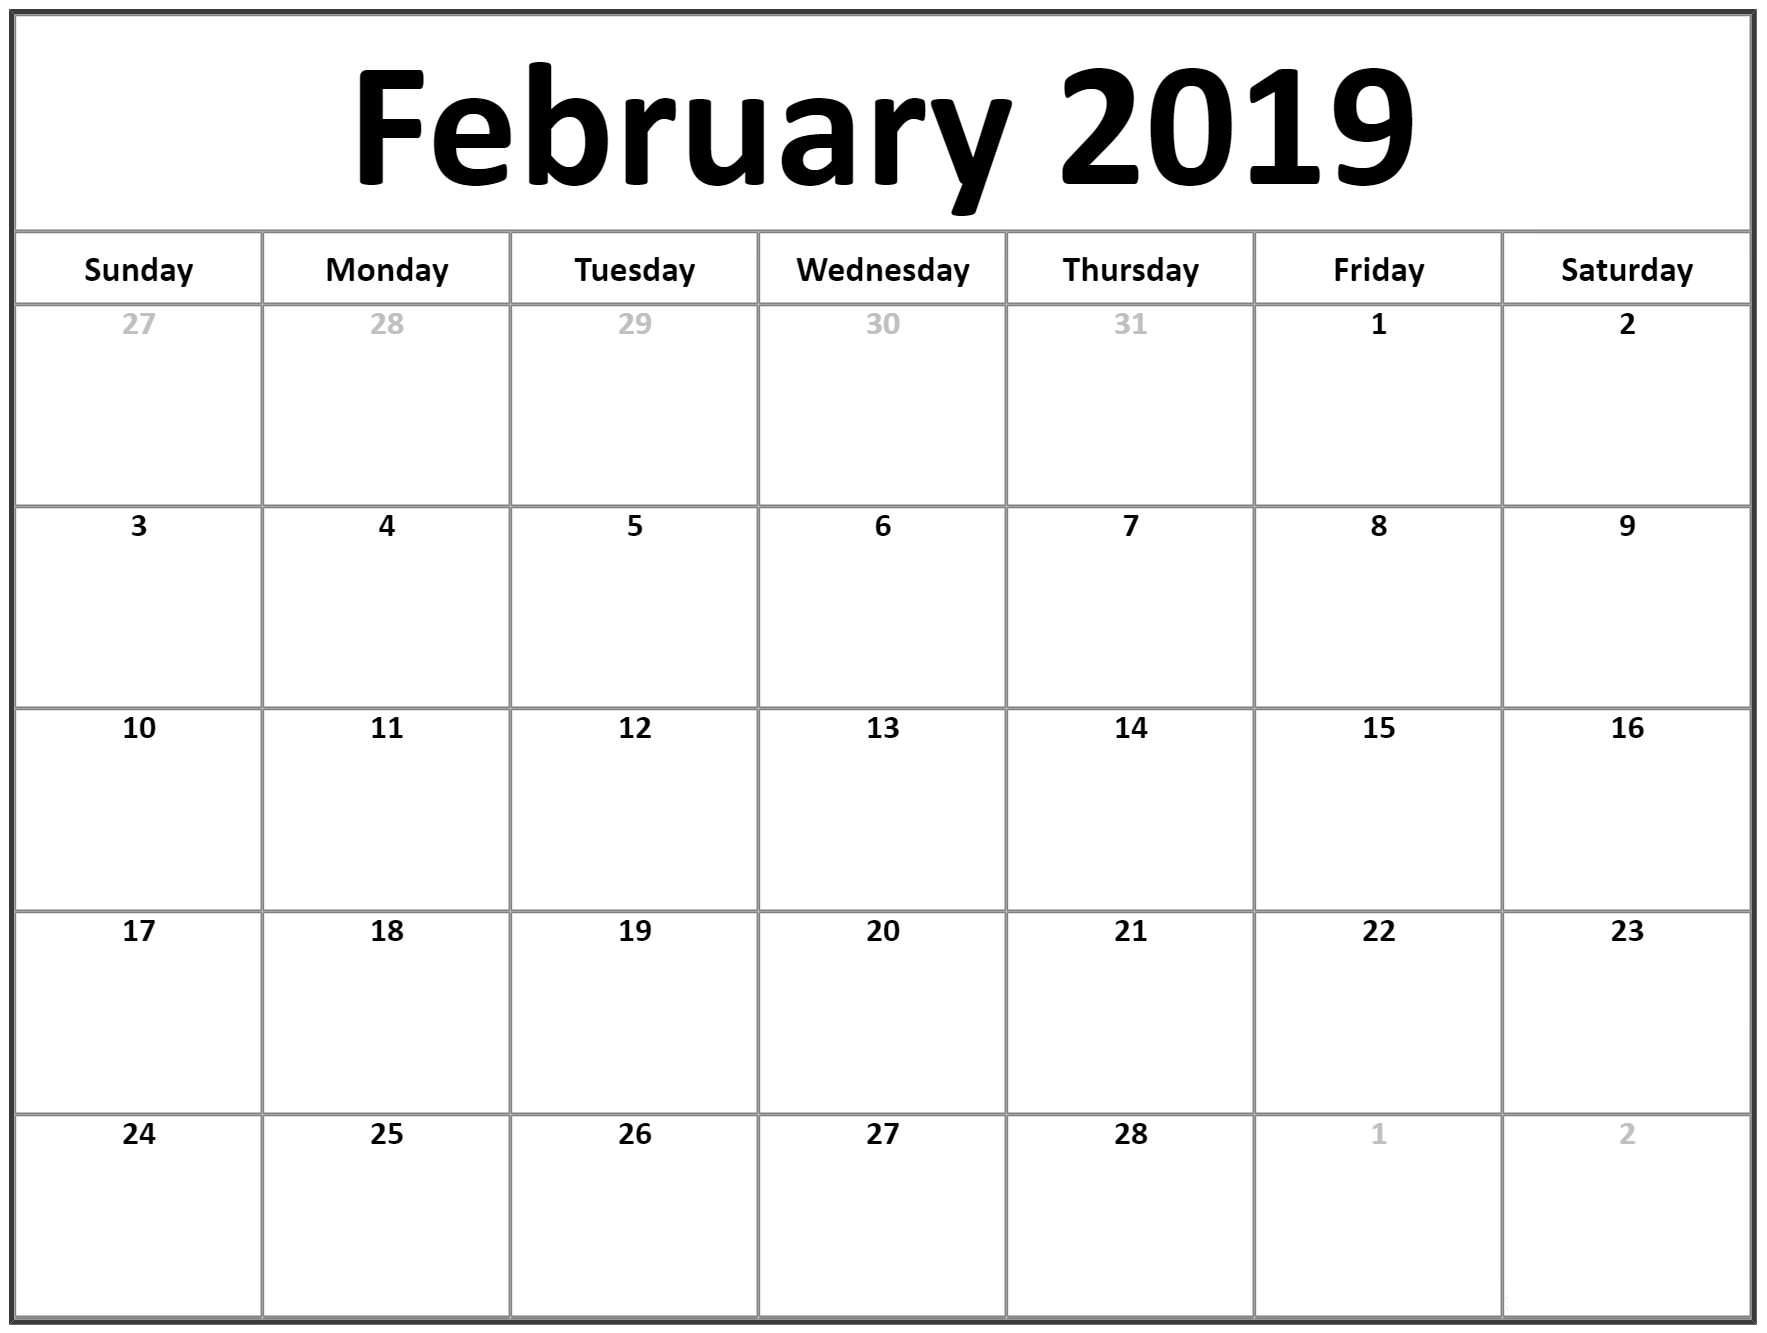 Blank February 2019 Calendar Printable - Free Printable Calendar